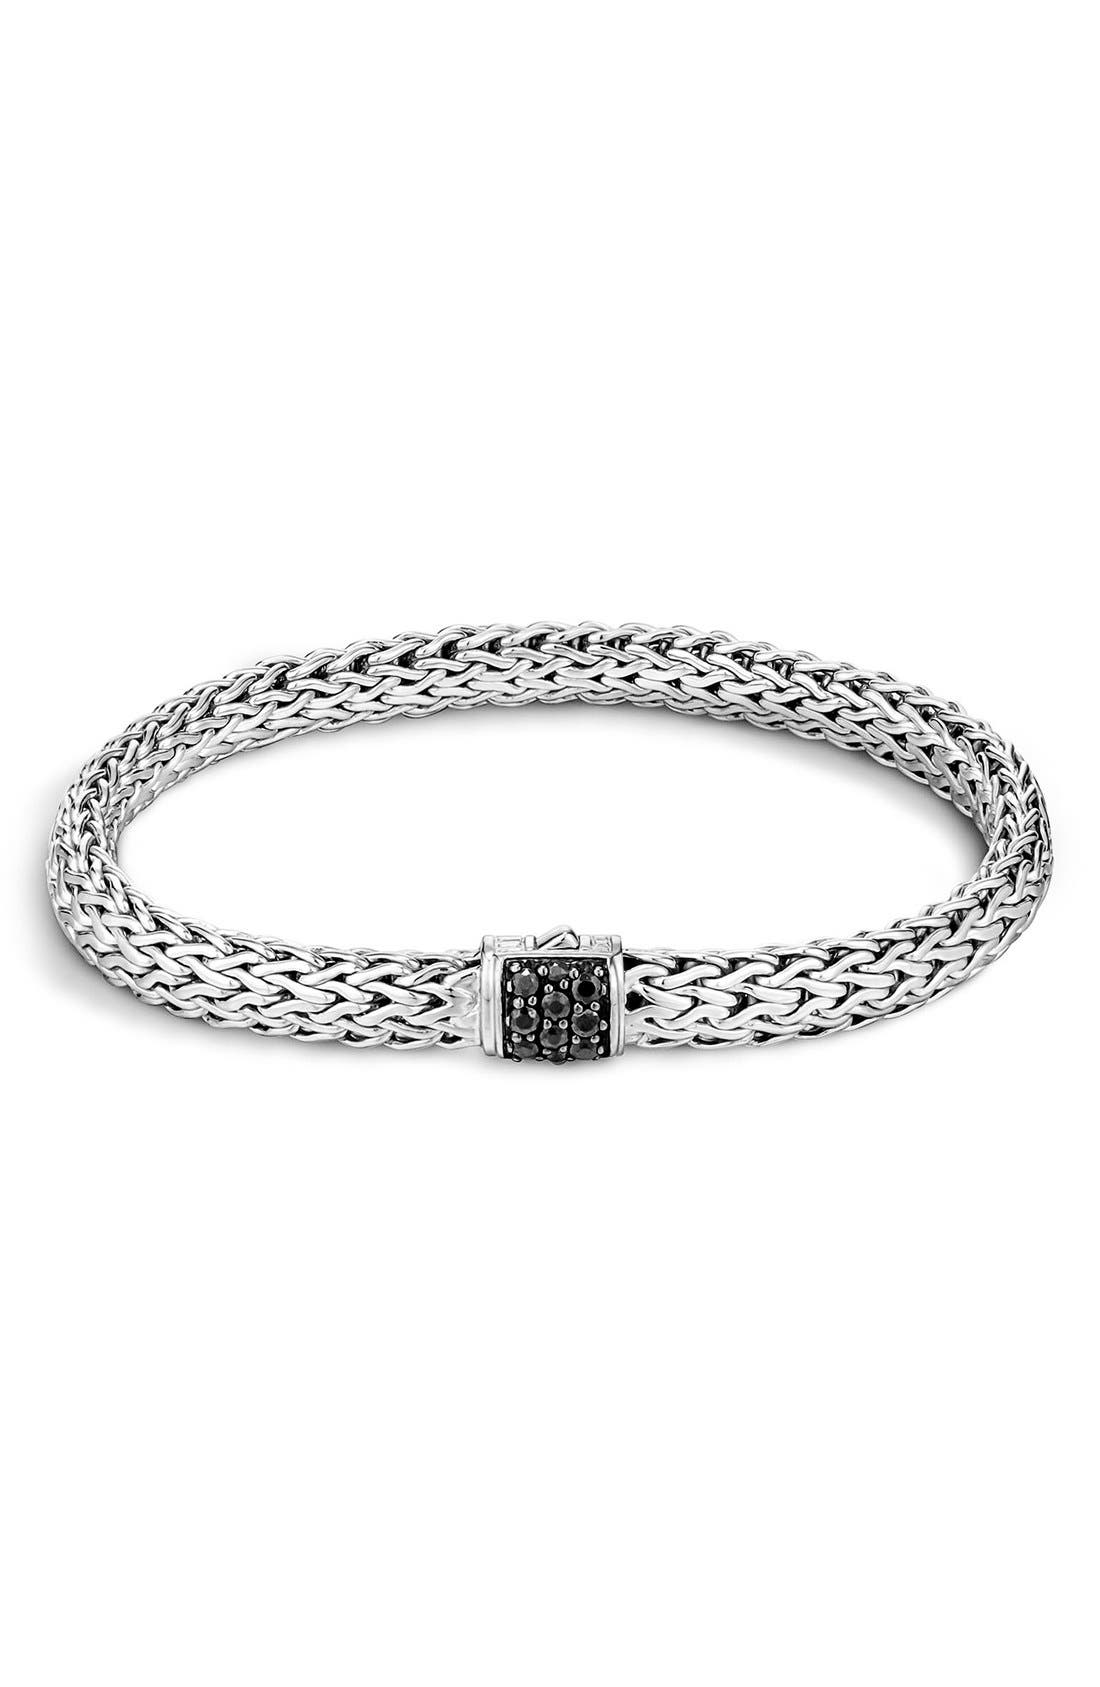 John Hardy 'Classic Chain' Small Bracelet